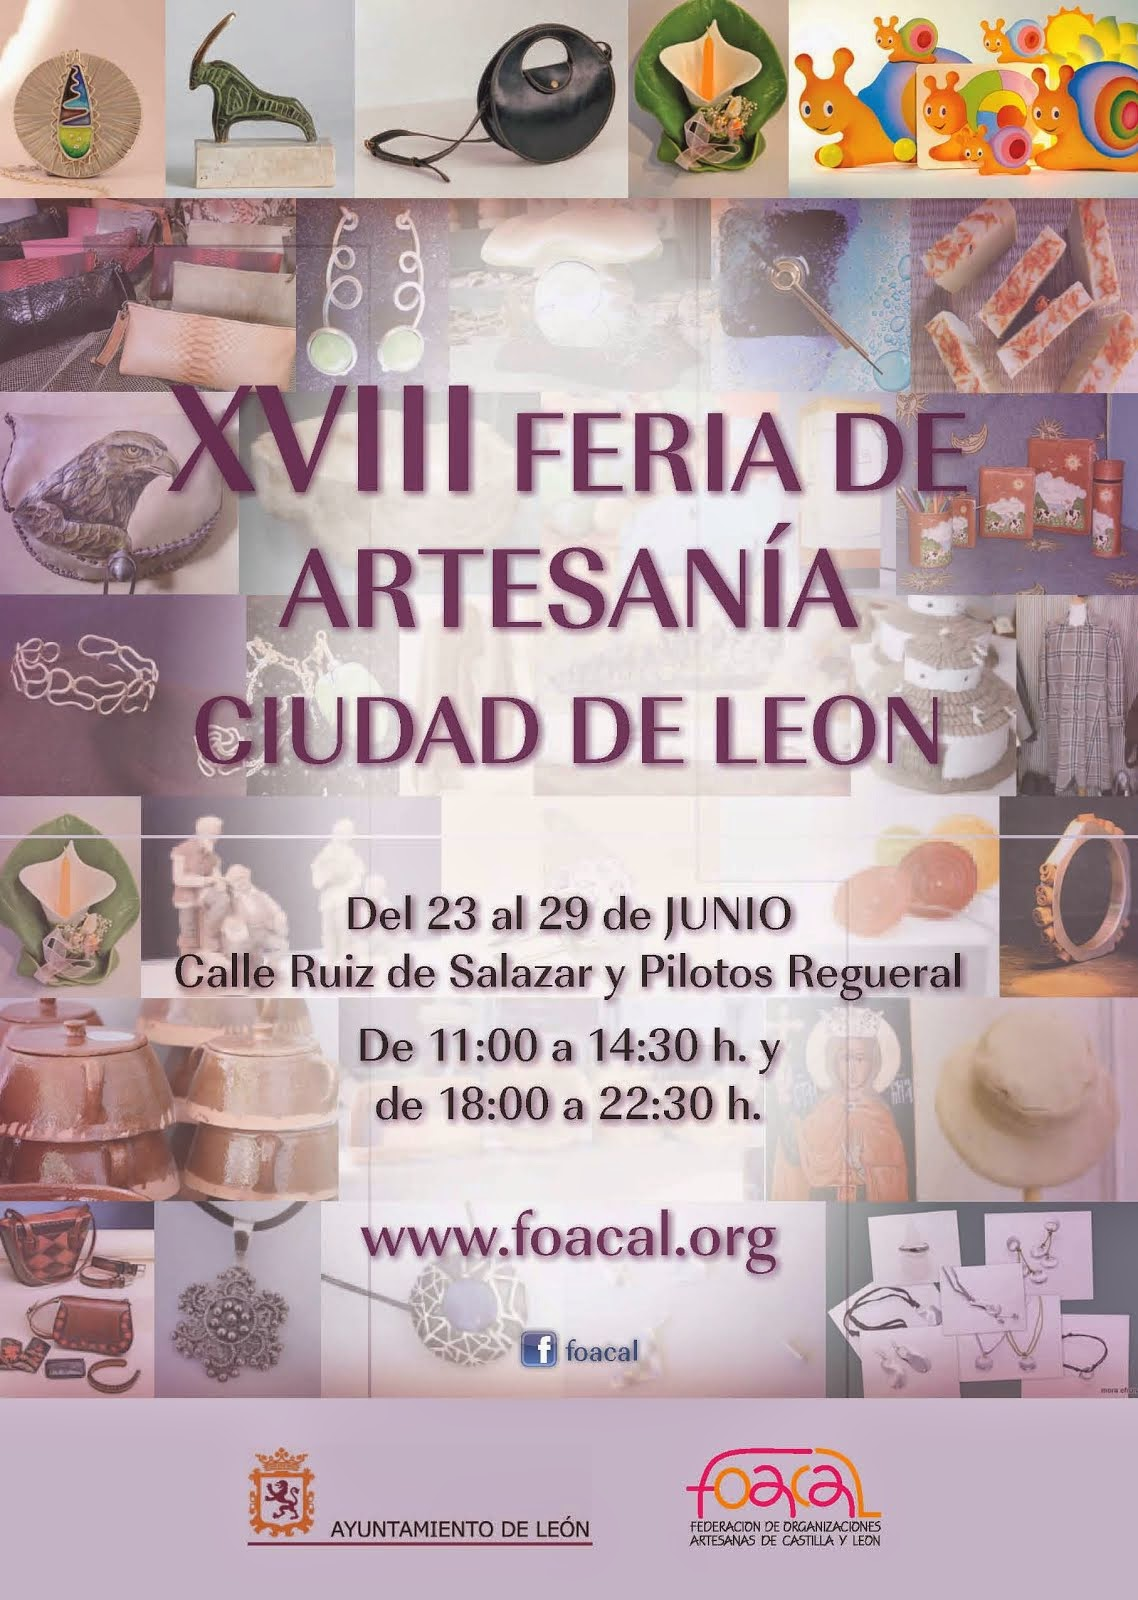 XVIII FERIA DE ARTESANÍA DE LEÓN